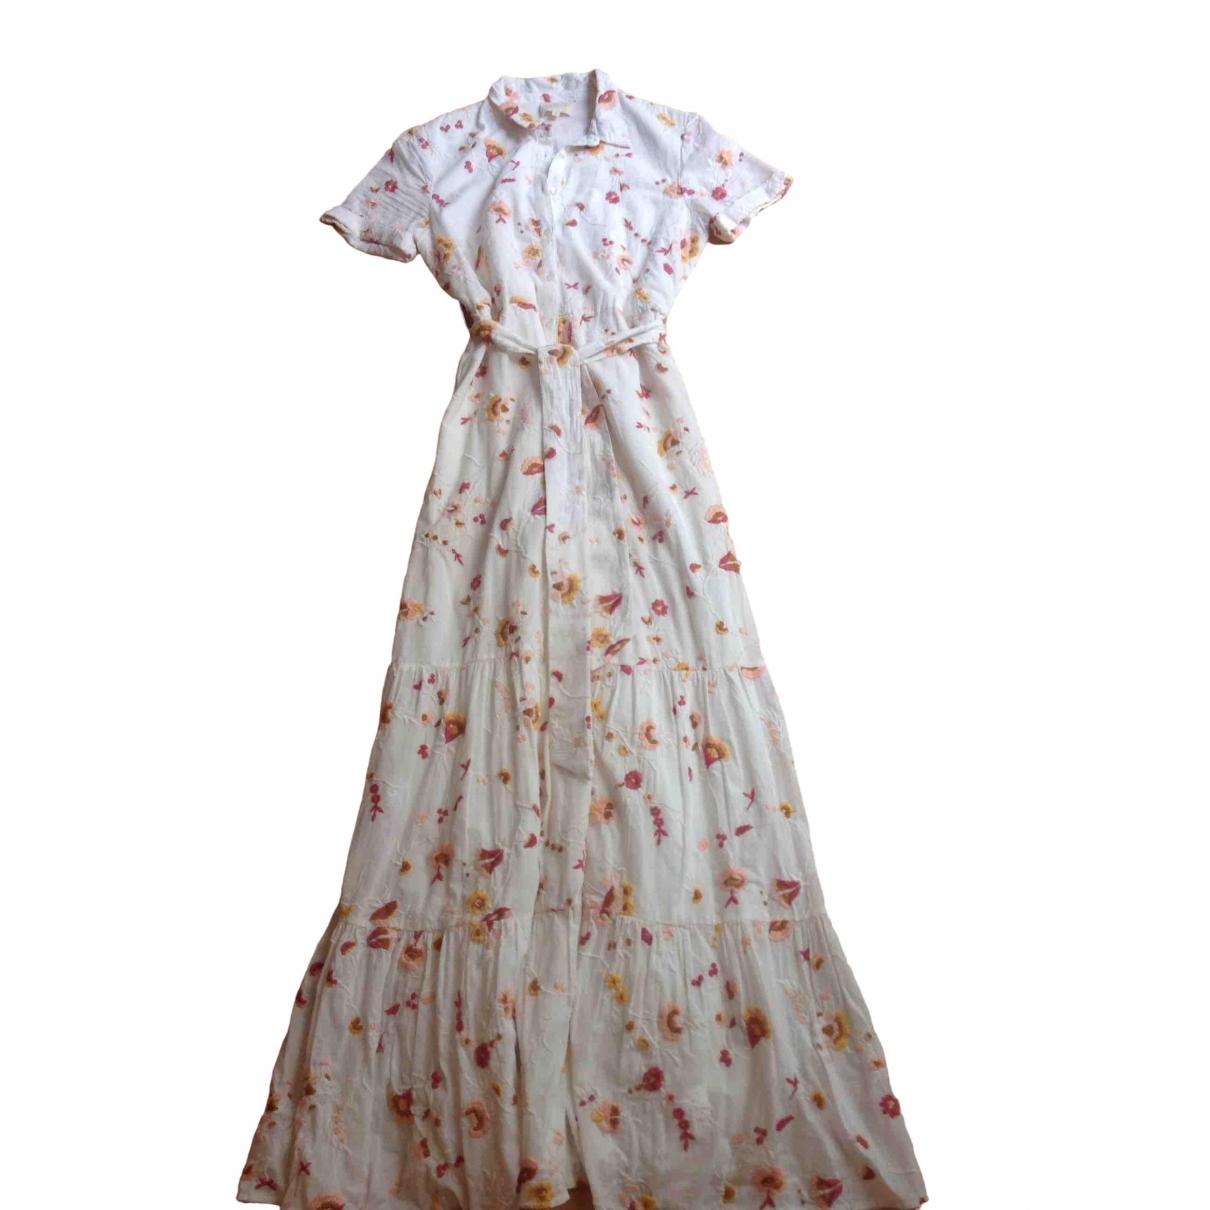 Sézane Spring Summer 2019 White Cotton dress for Women 36 FR